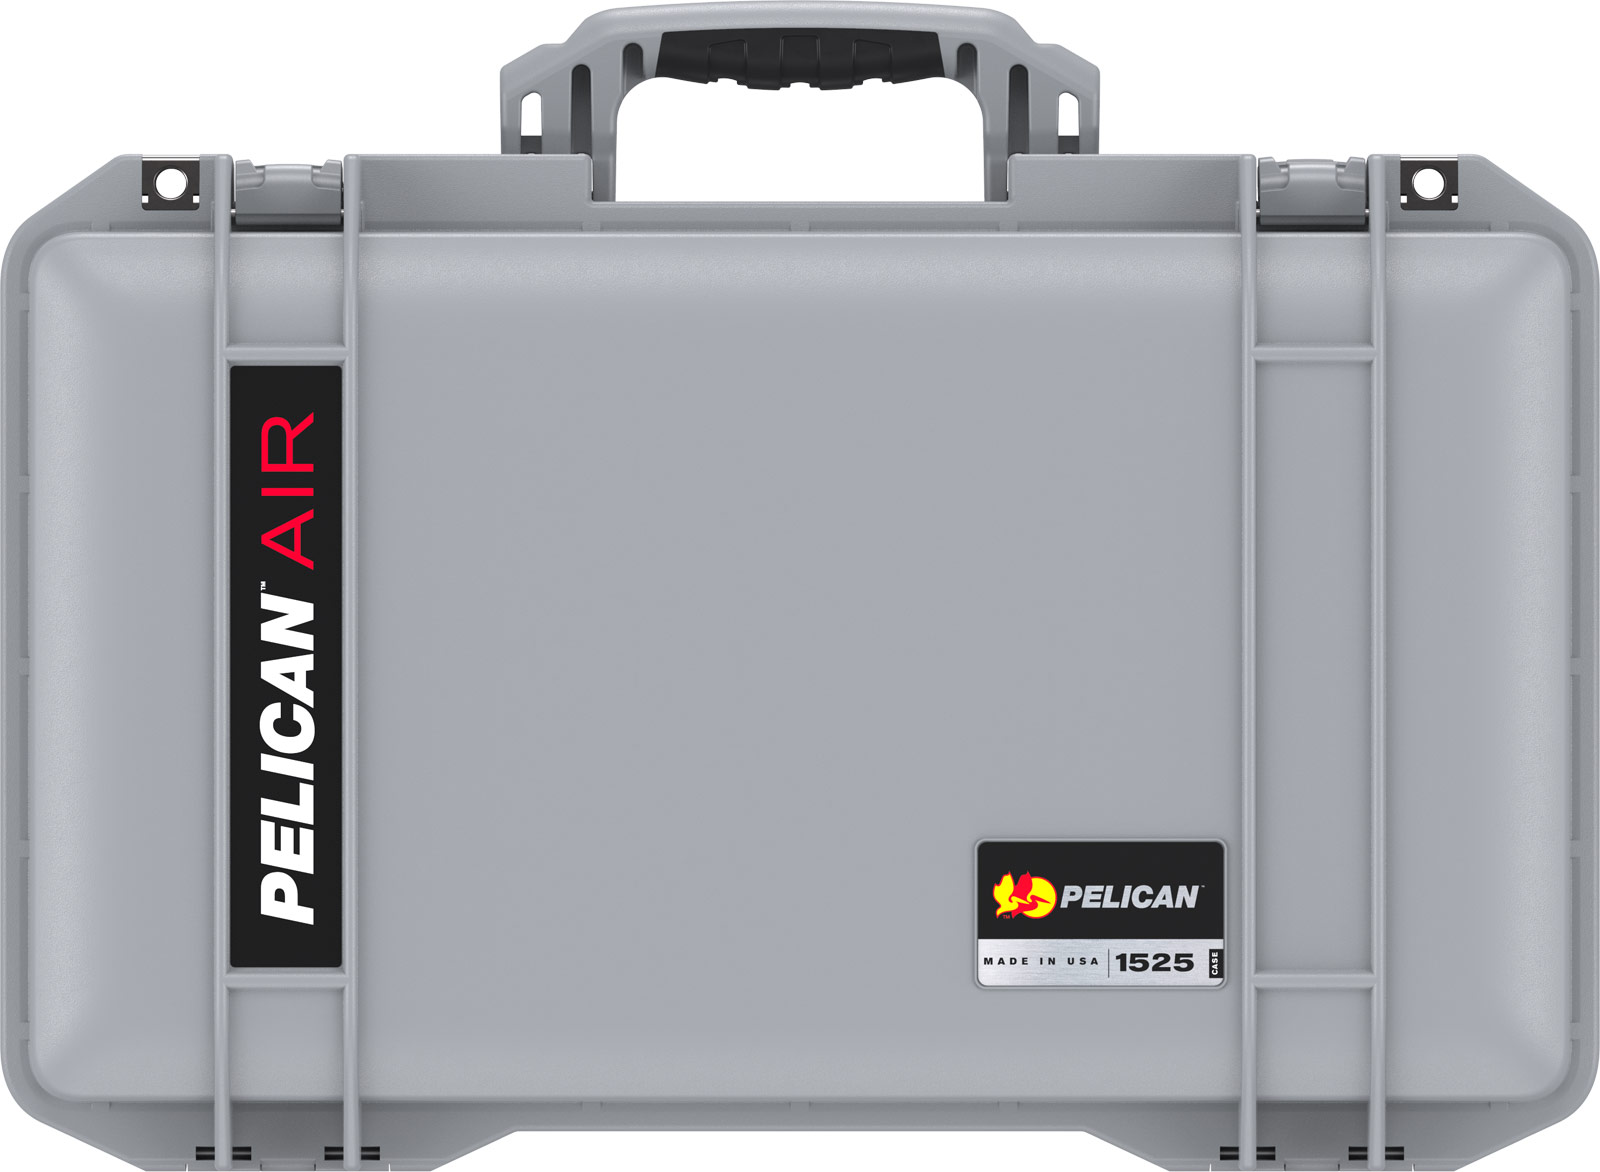 pelican waterproof cases lightweight air case